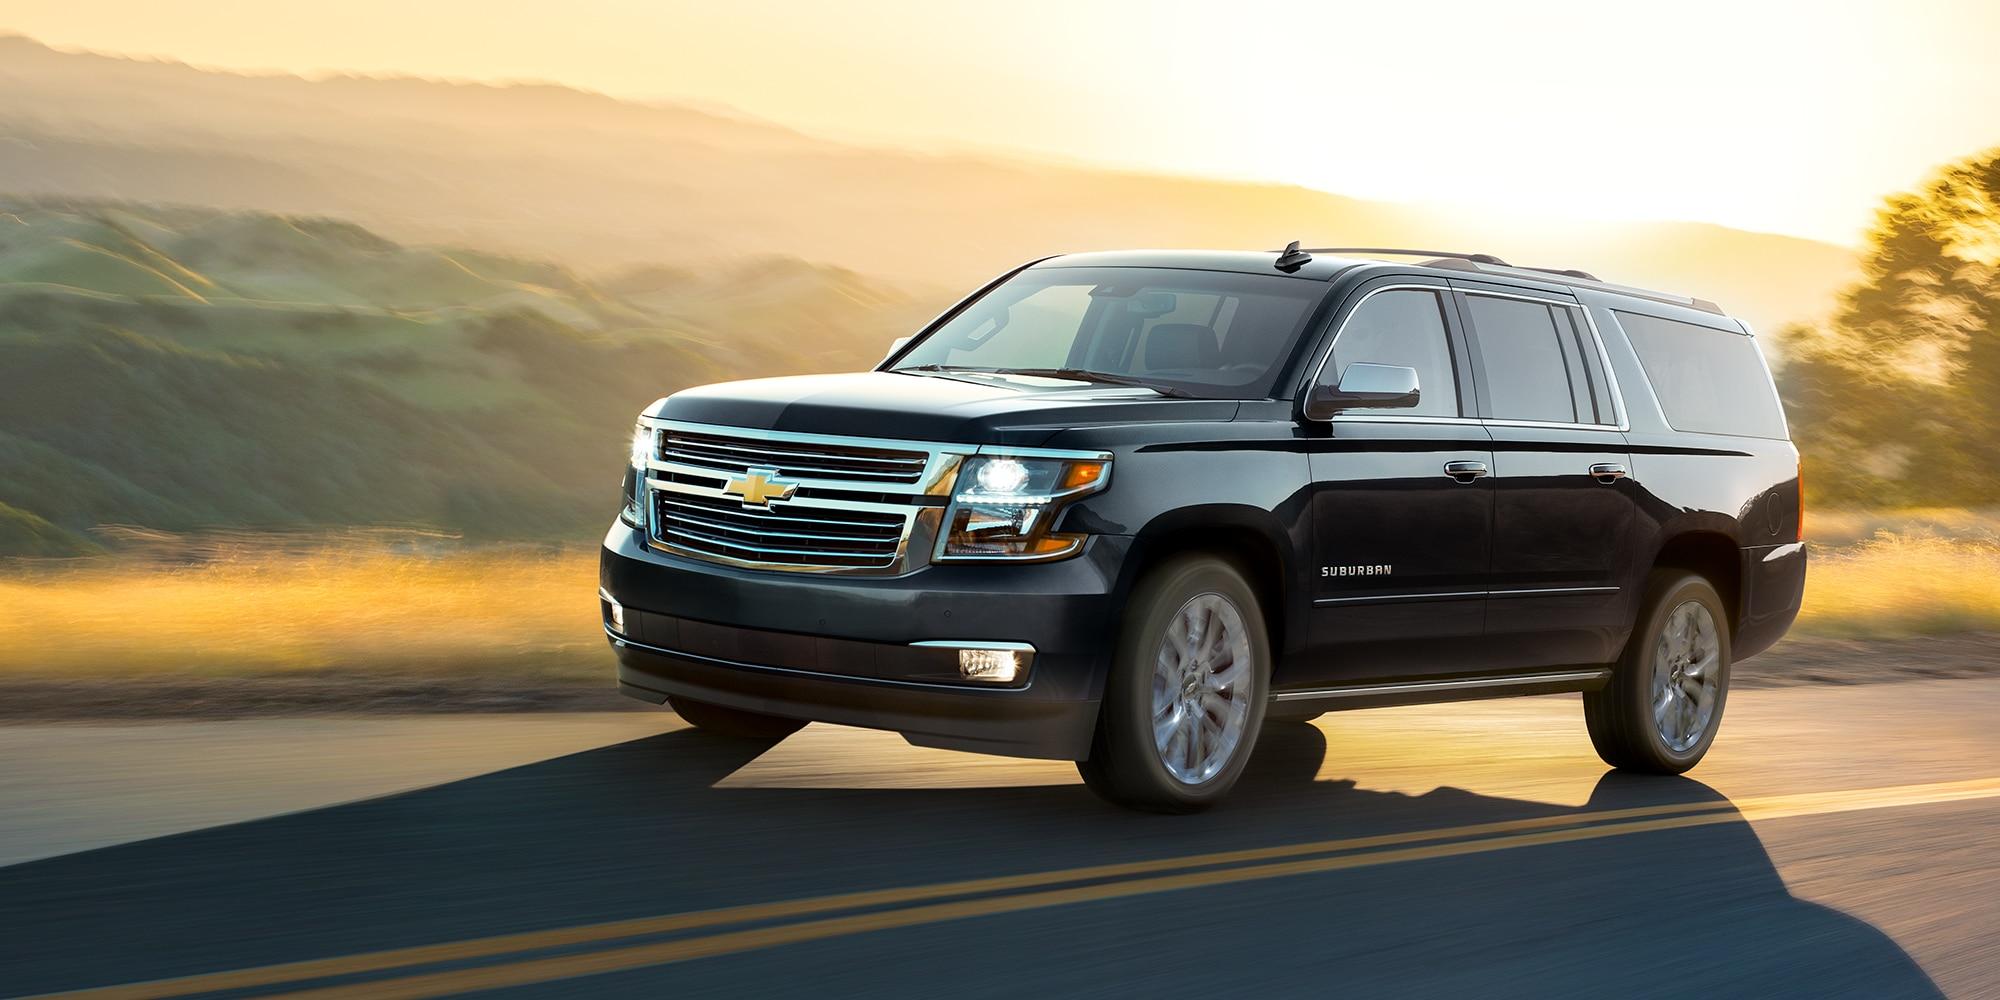 Gama de SUV Chevrolet: Suburban 2019